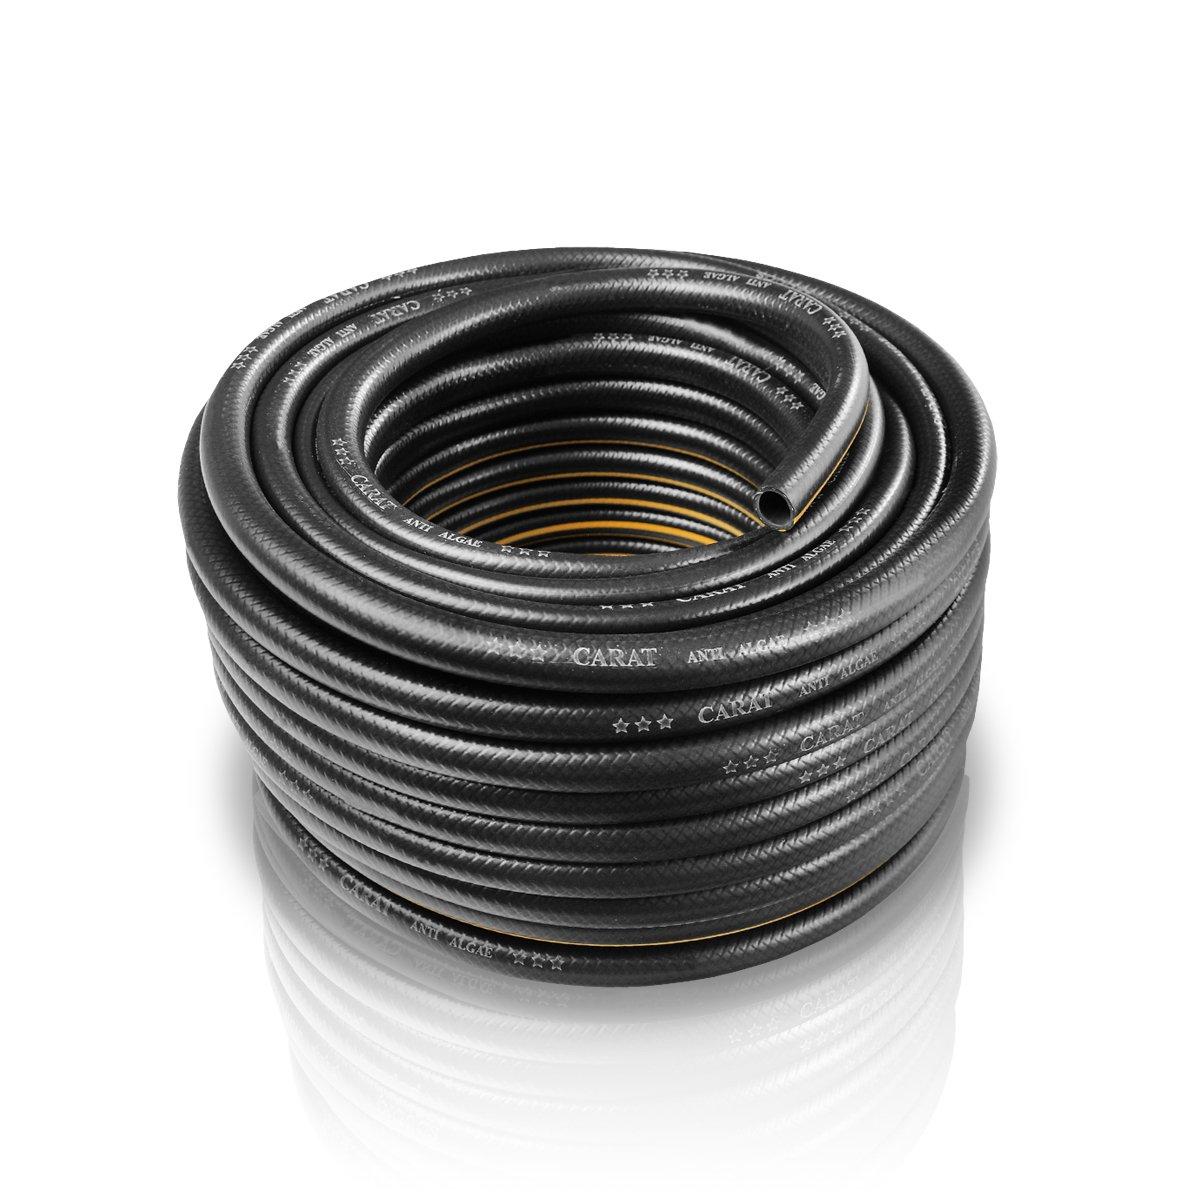 Bradas WFC1 / 230 Garden Carat 1/2 Inch 30 M Black WFC1/230